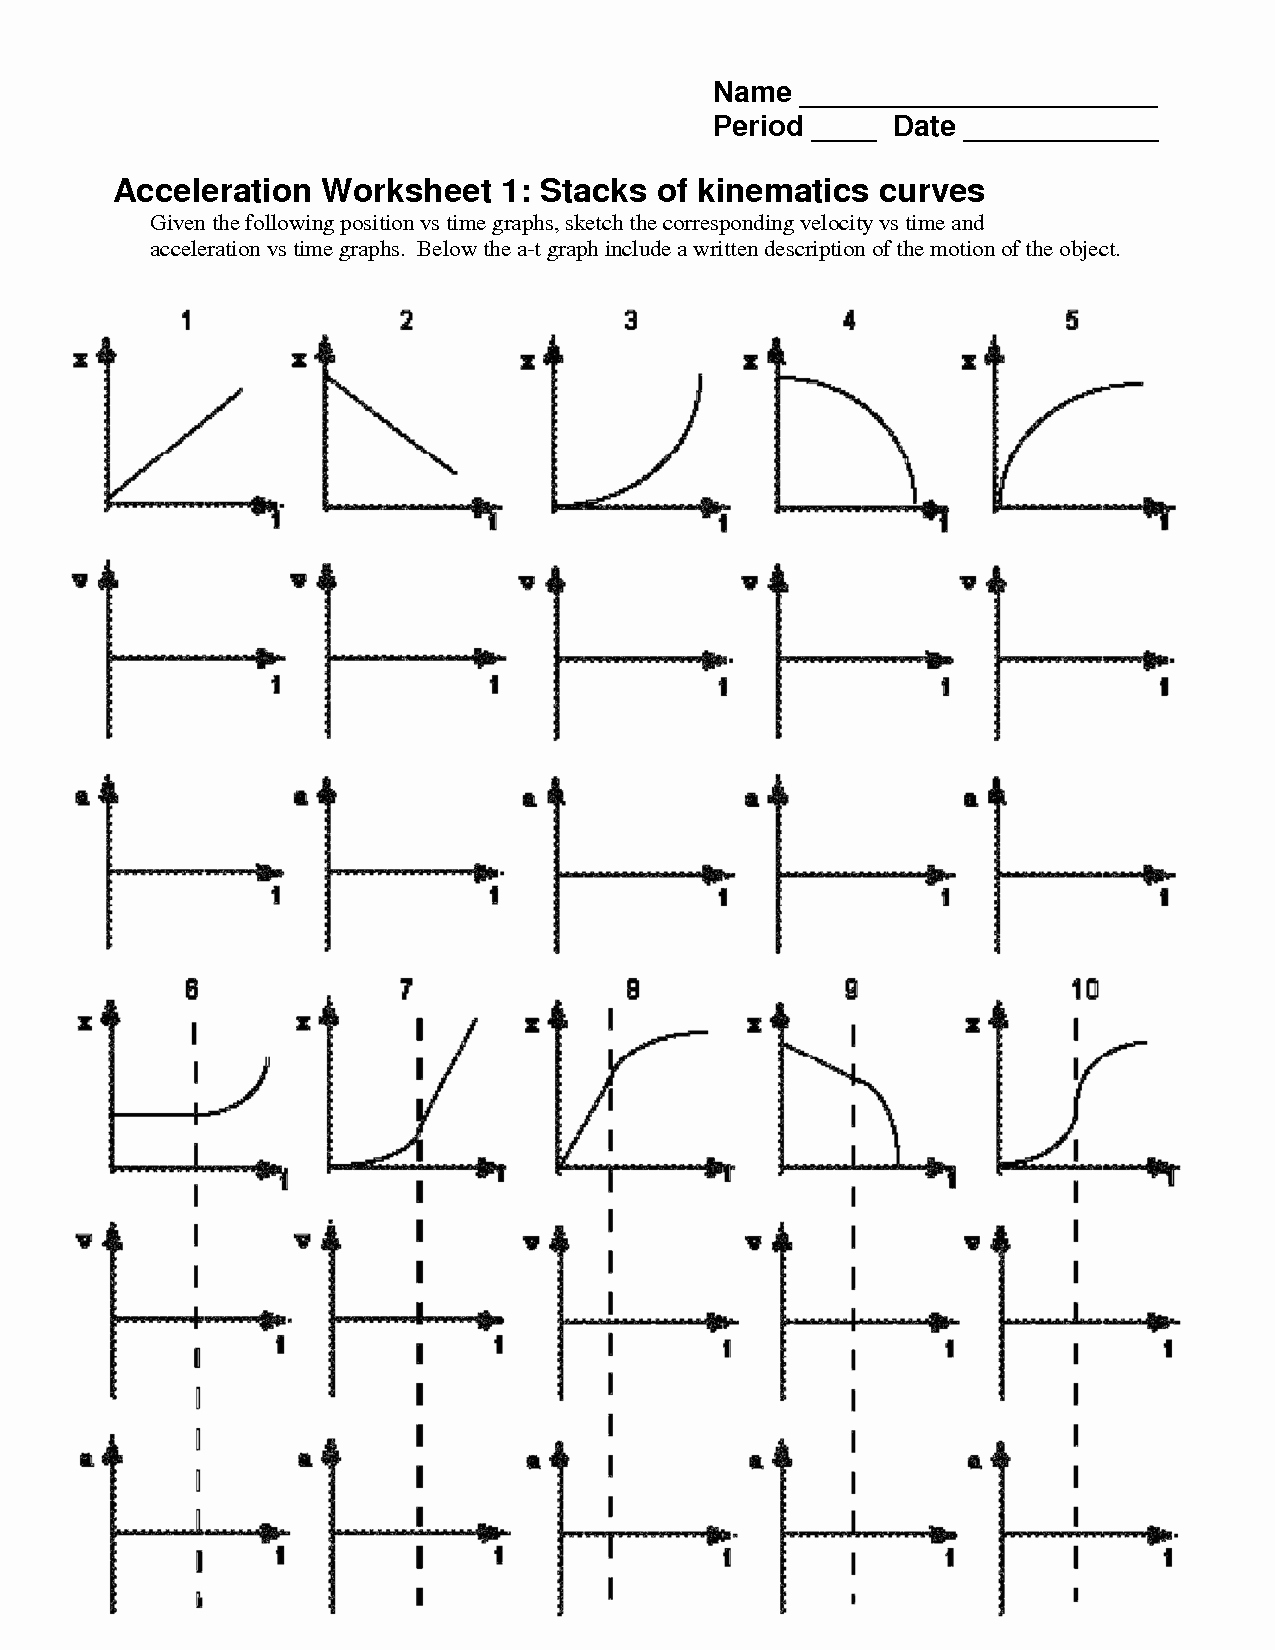 50 Motion Graphs Worksheet Answer Key